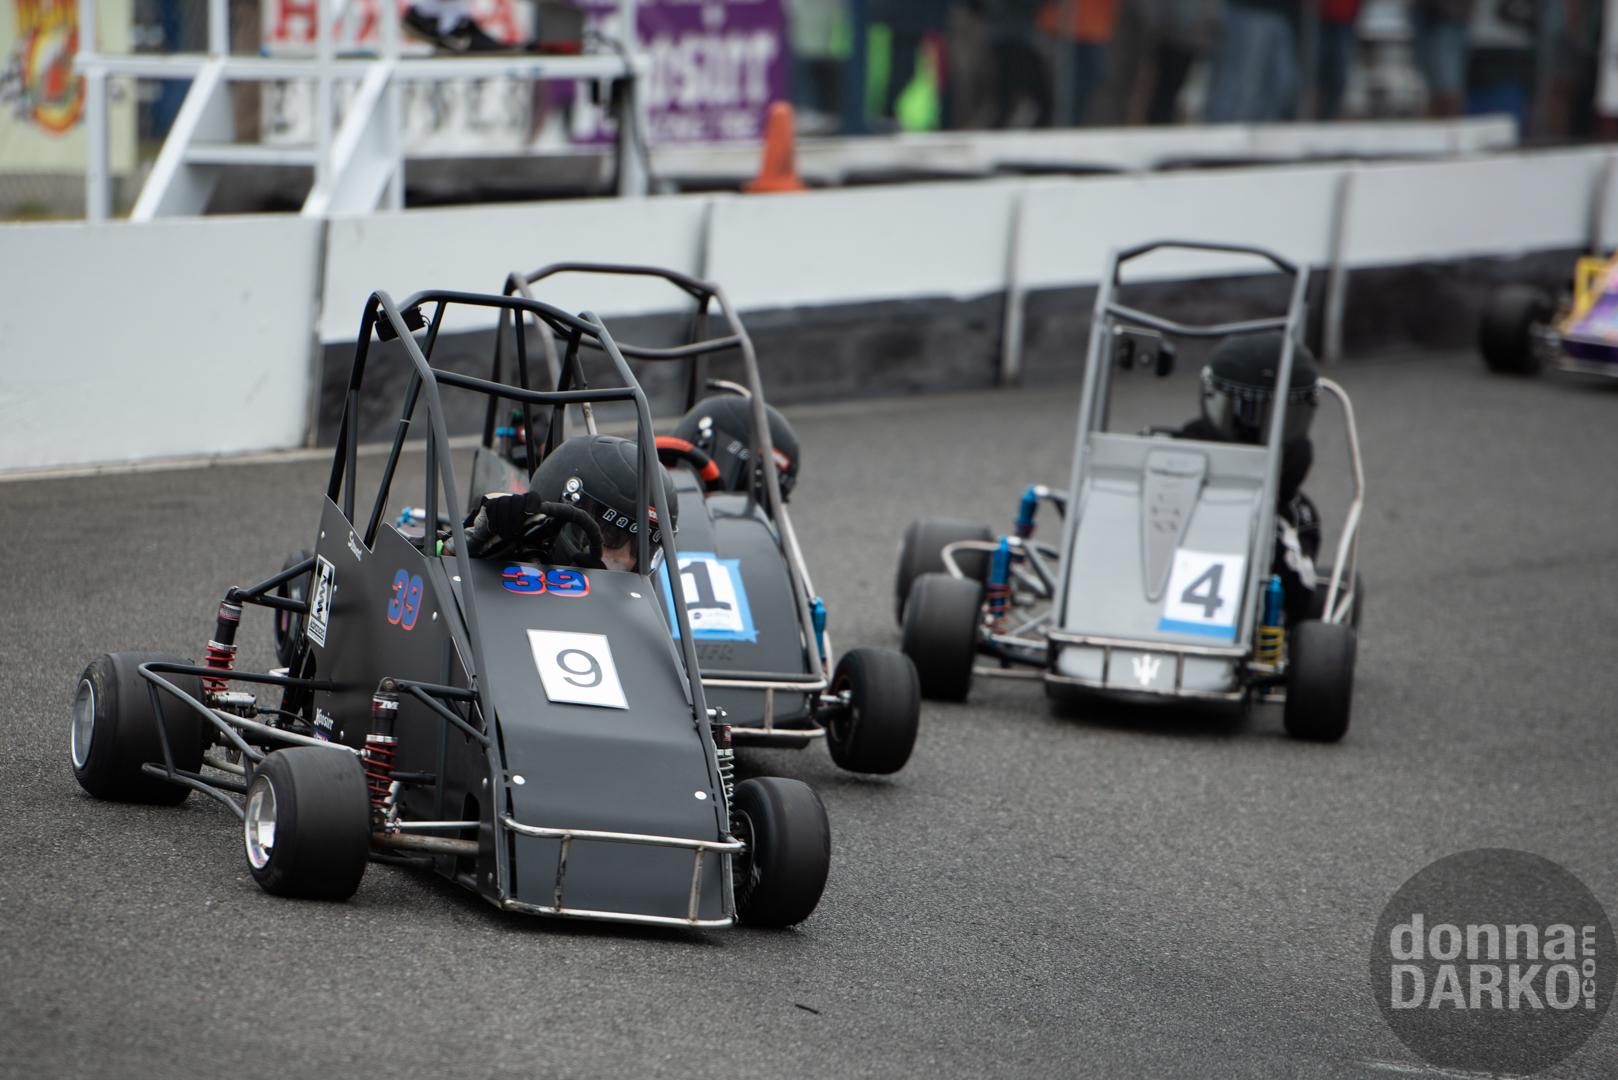 QWMA (Racing) 8-11-2019 DSC_5877.jpg